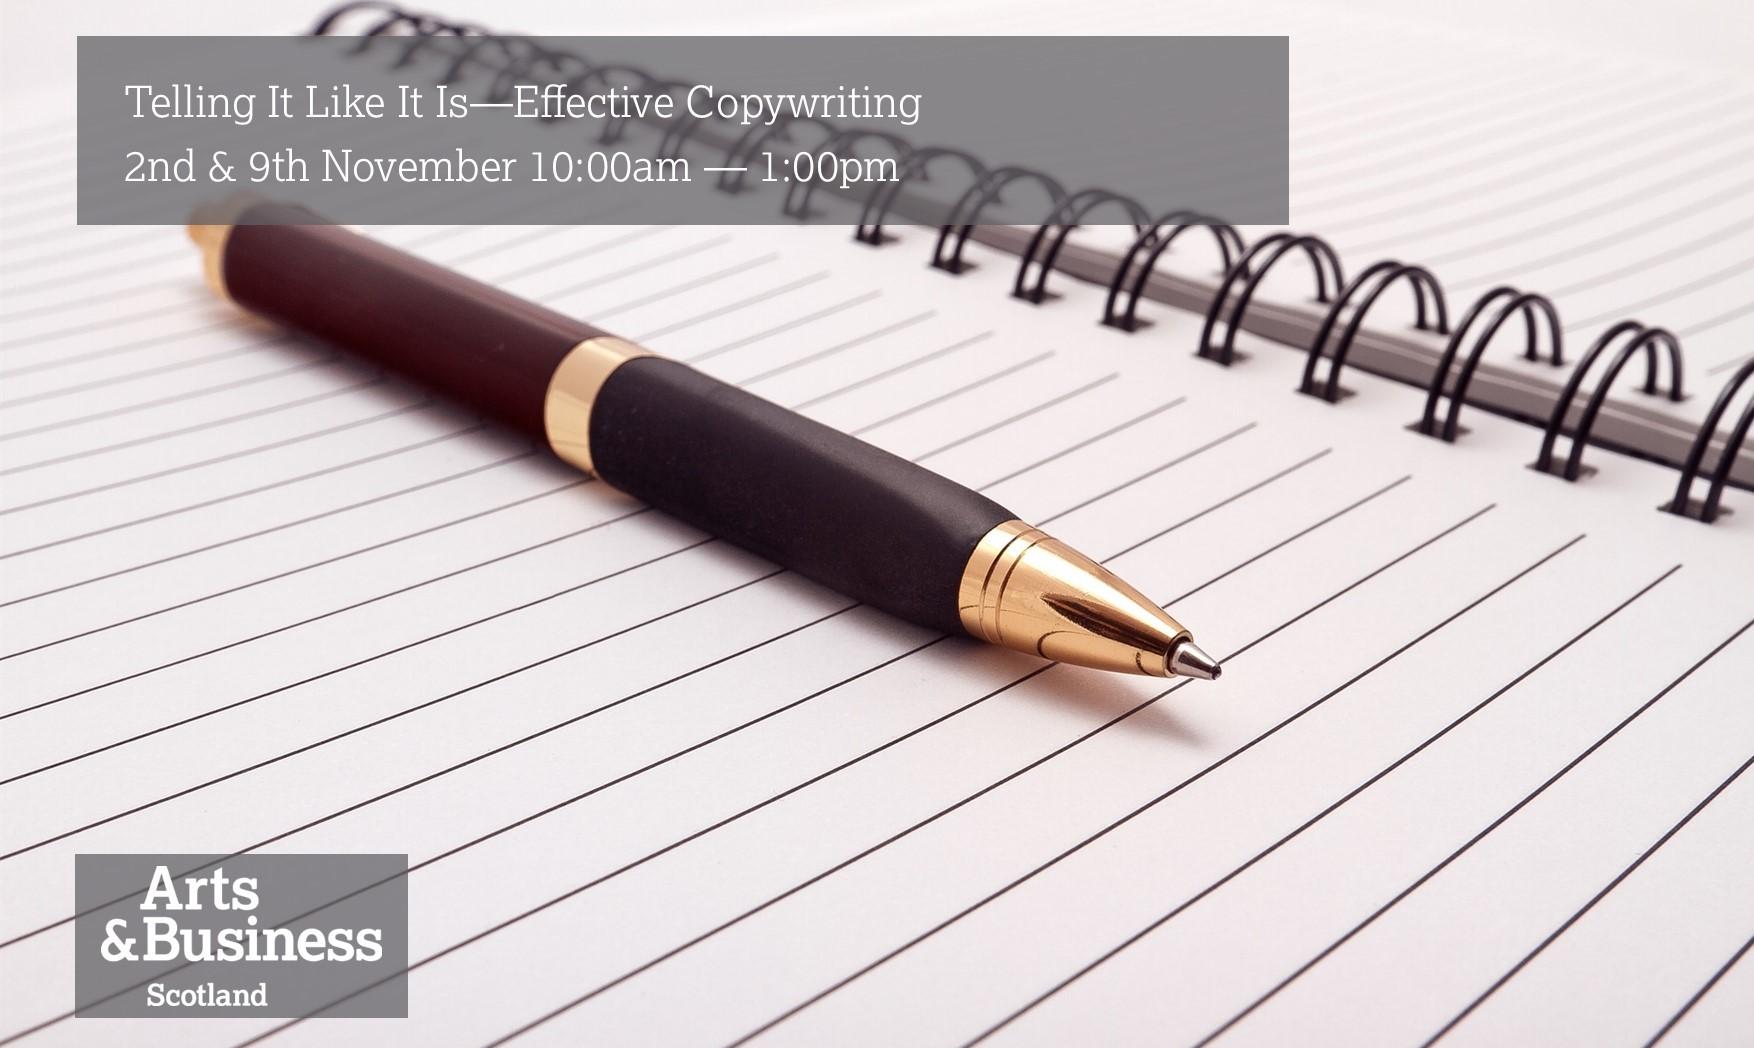 Telling It Like It Is – Effective Copywriting Image #0